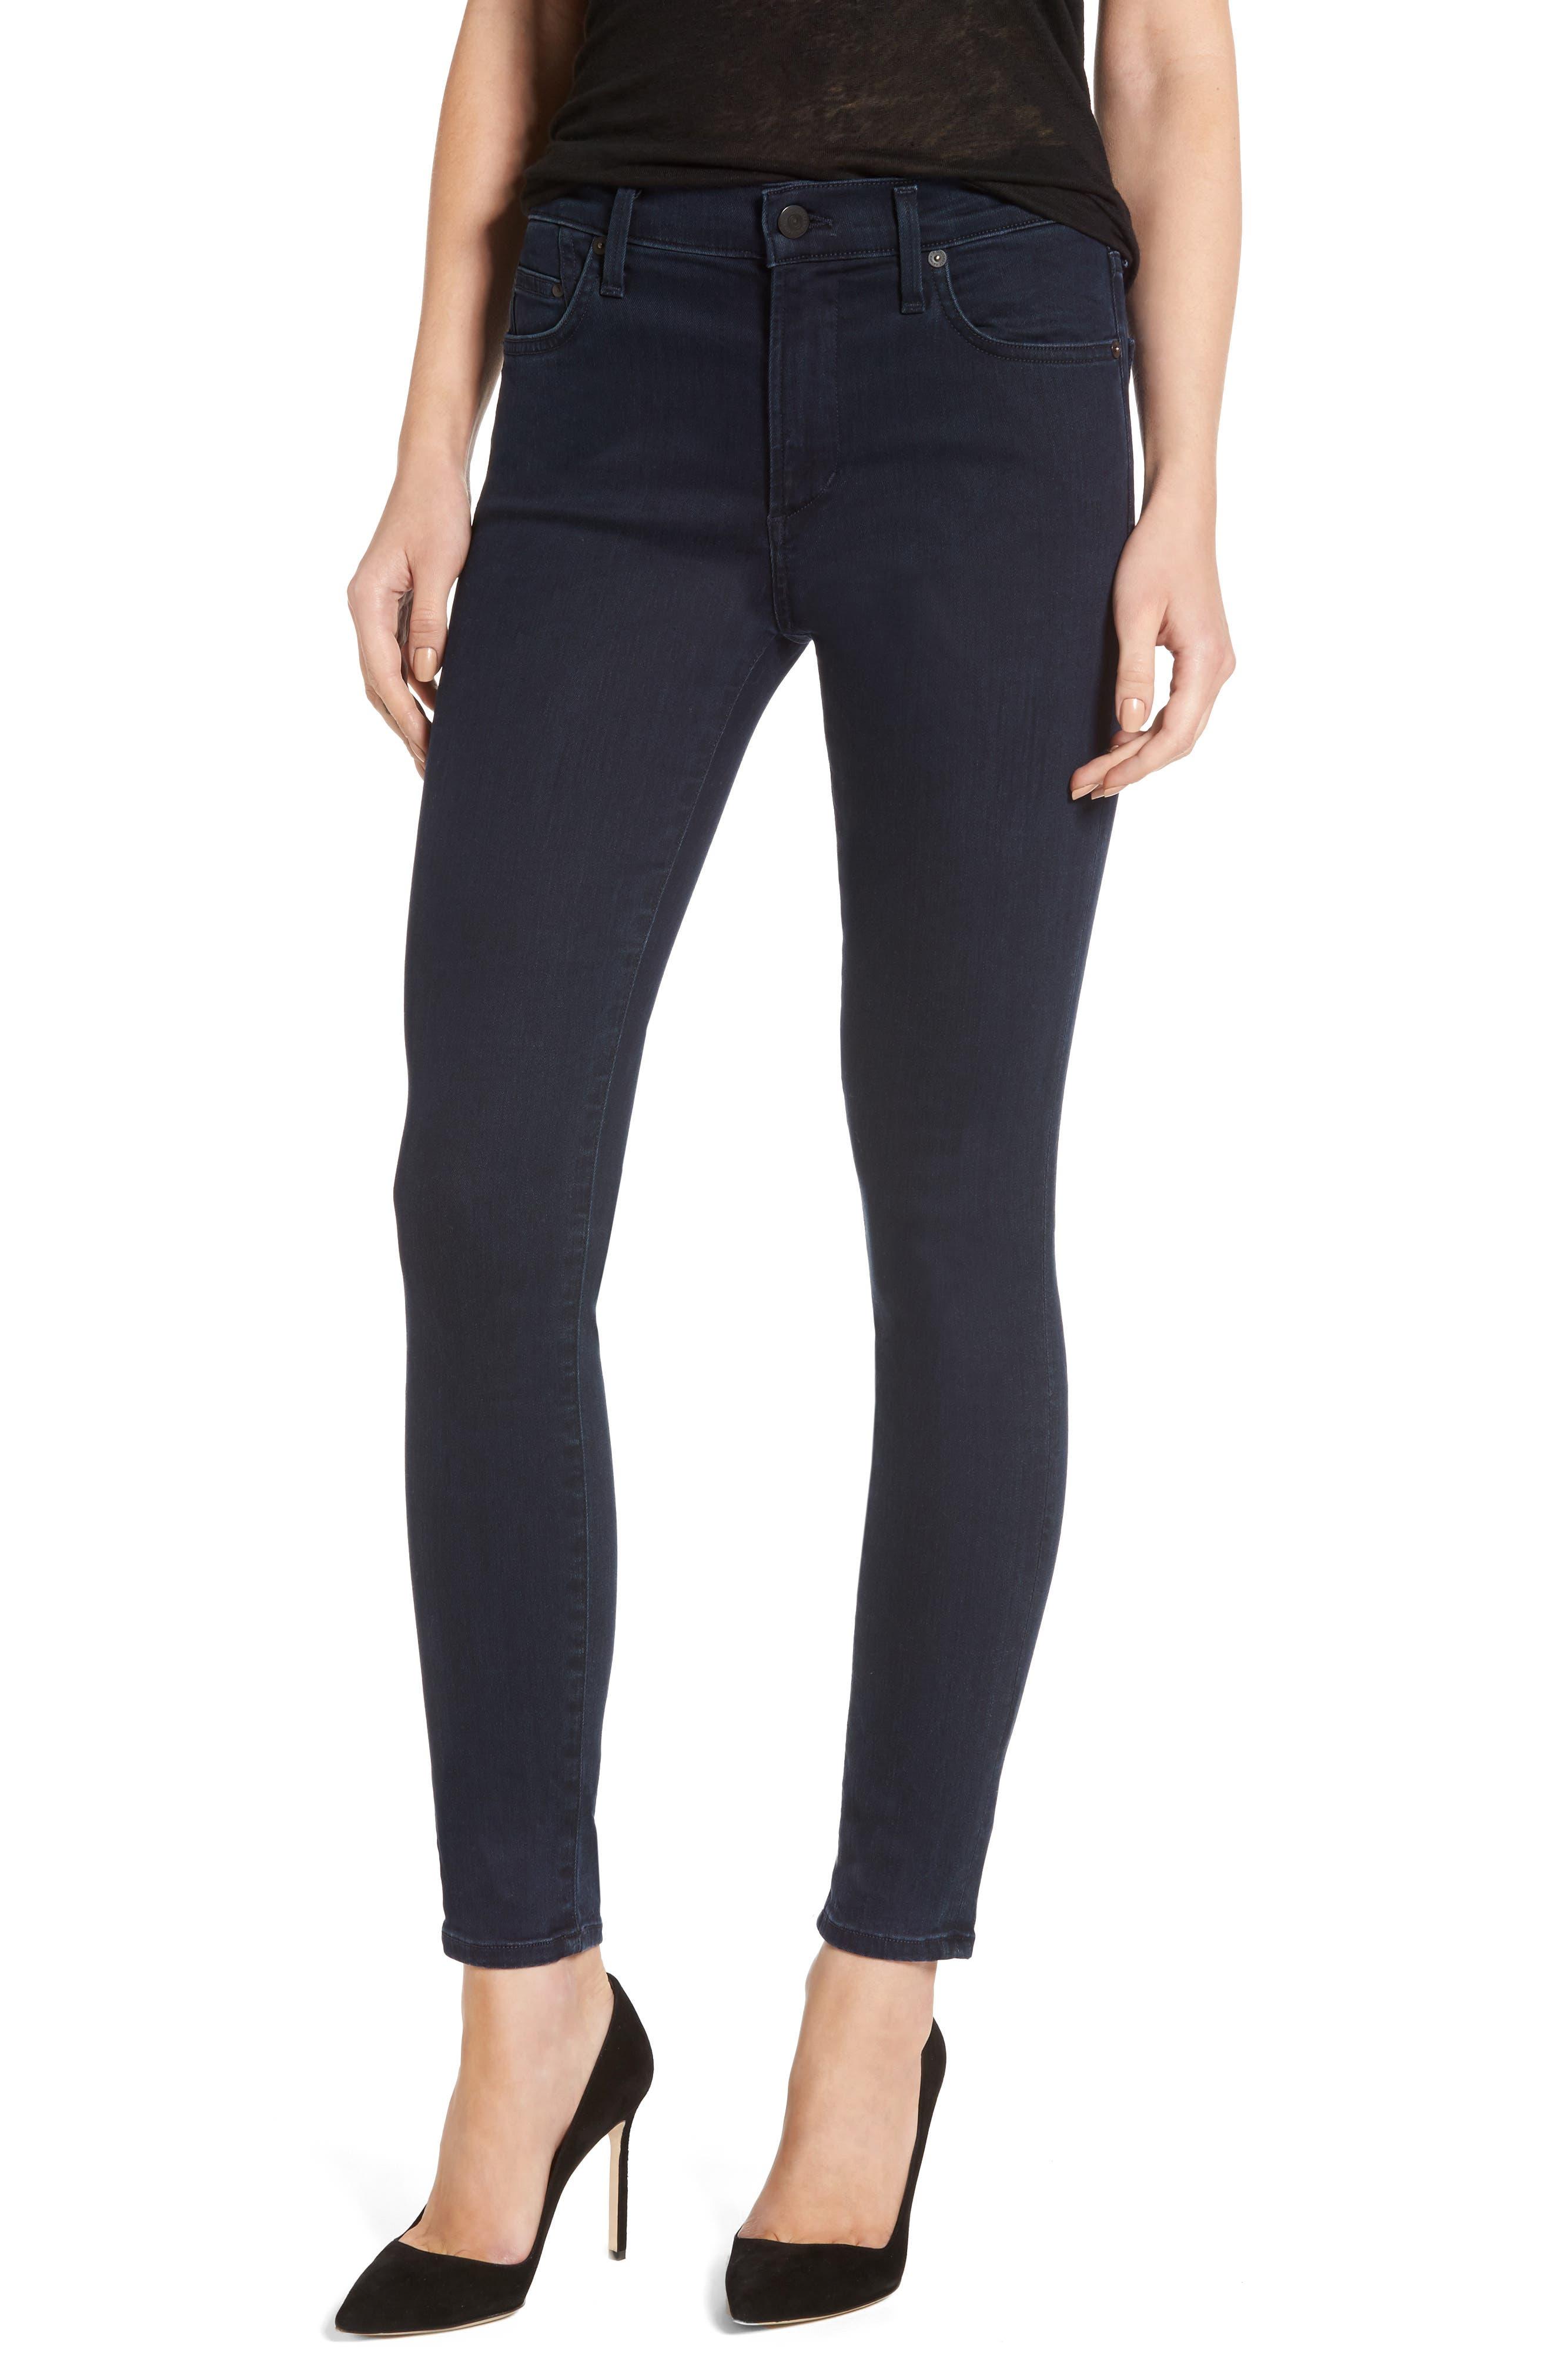 Rocket High Waist Skinny Jeans,                         Main,                         color, Ozone Ink